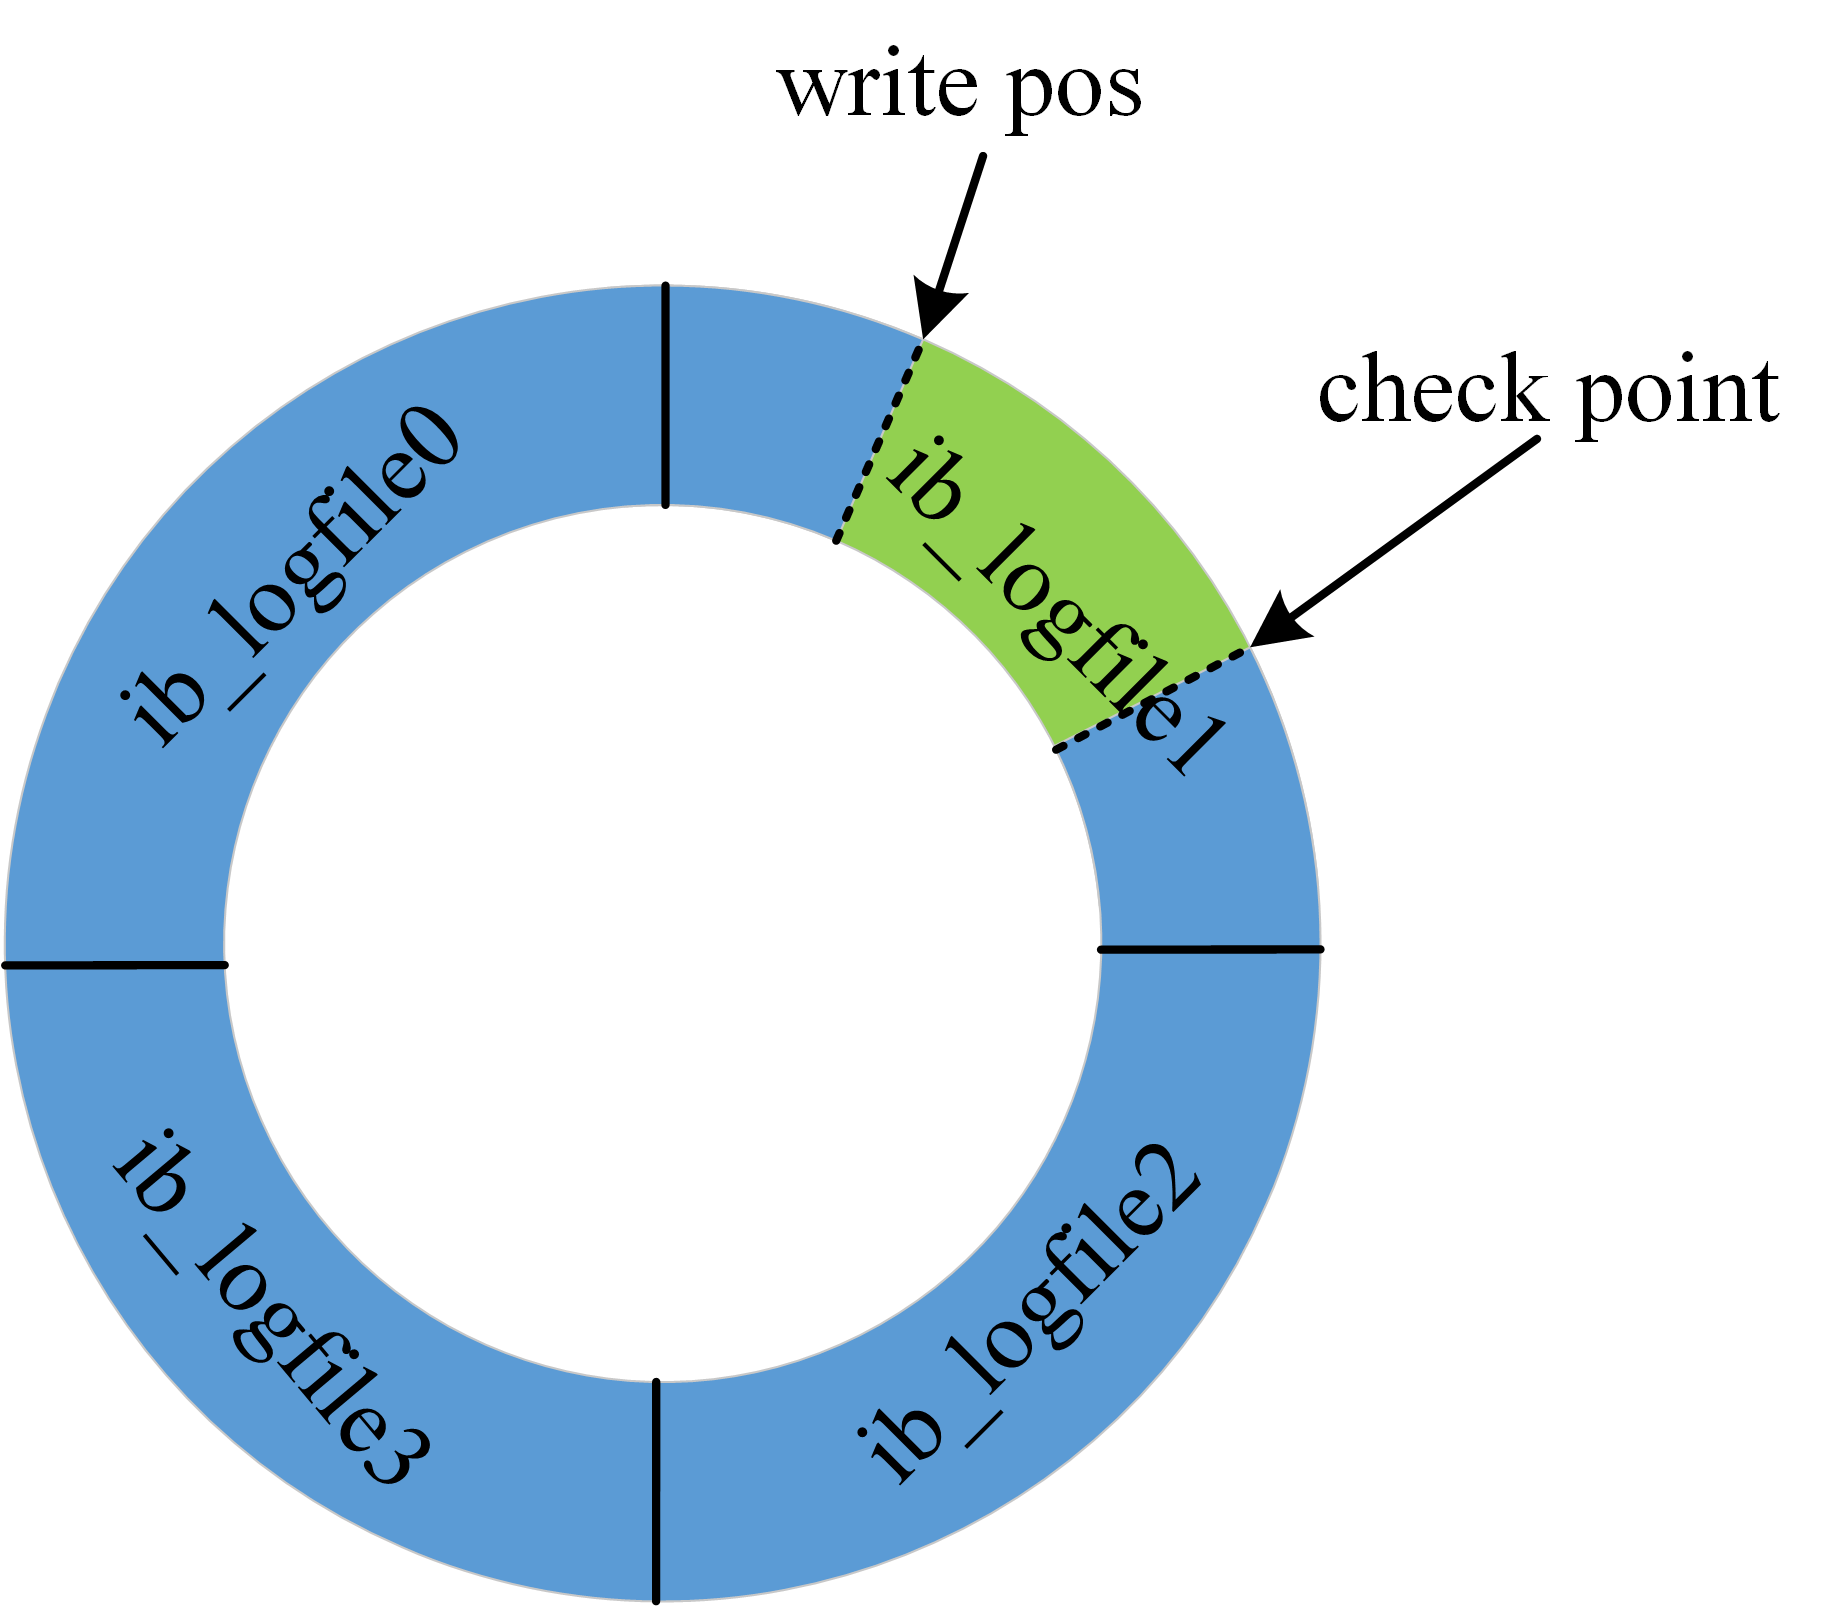 redolog循环写